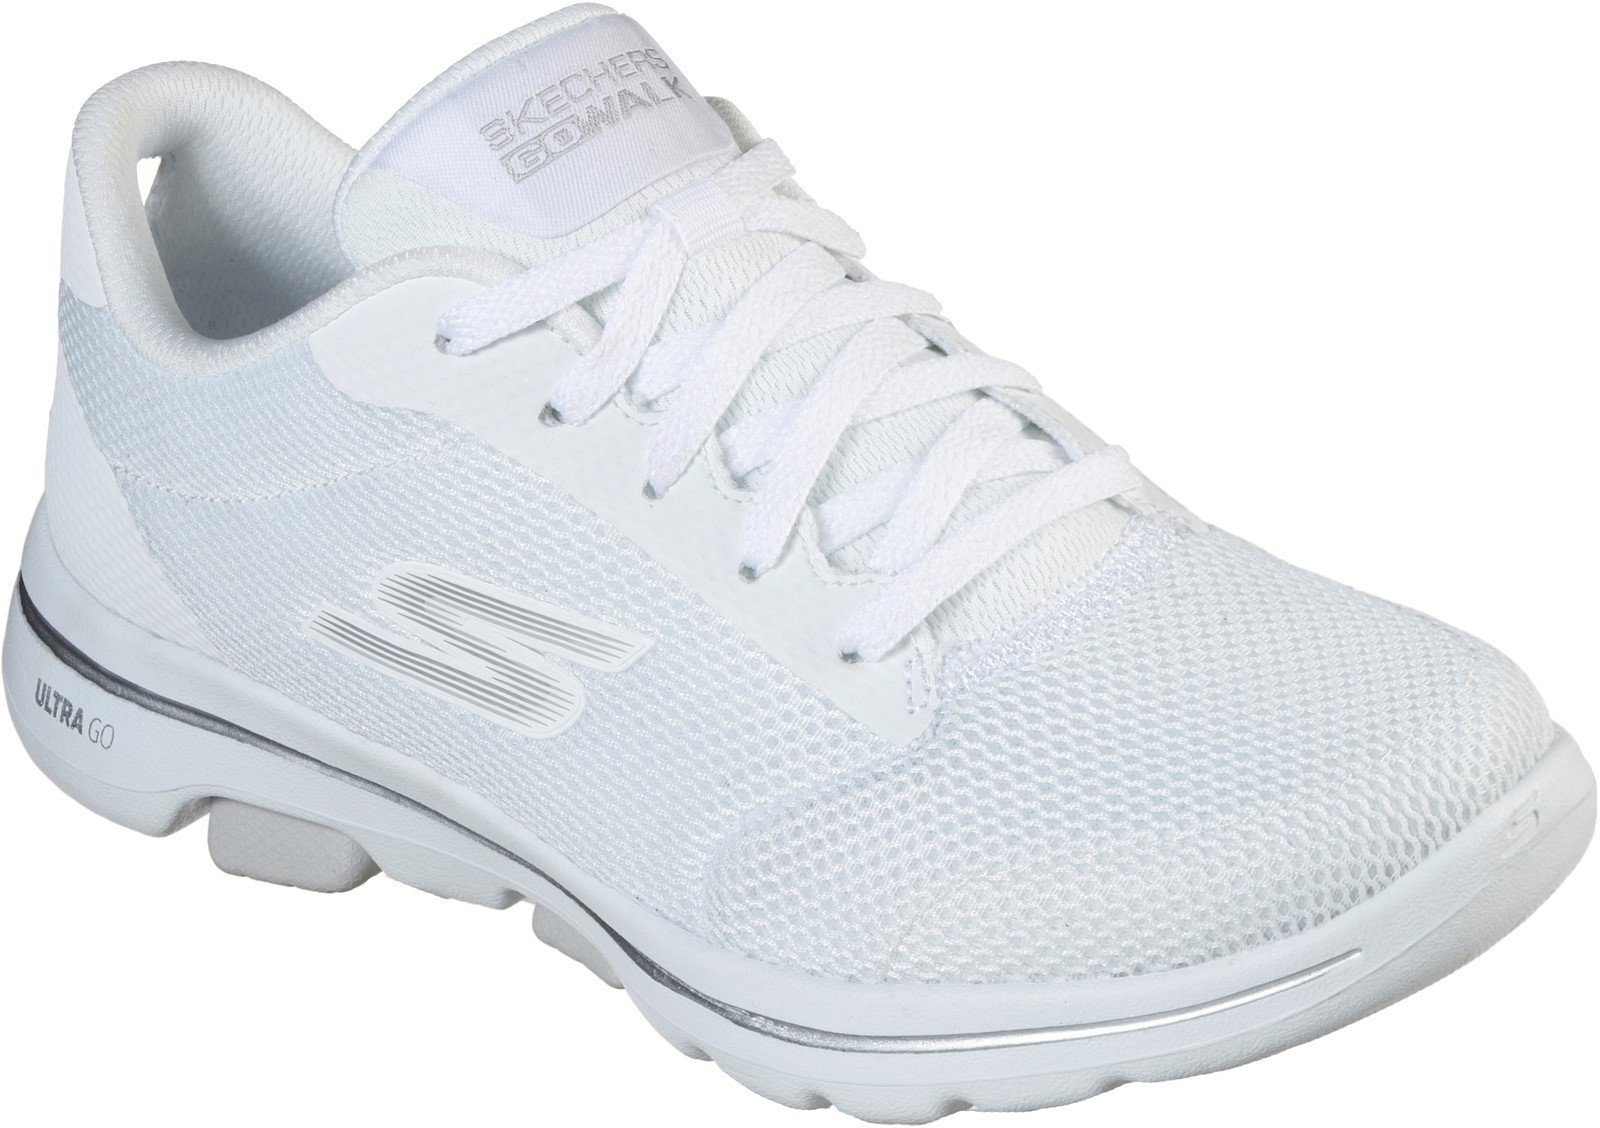 Skechers Women's Gowalk 5 Lucky Sports Trainer Various Colours 31033 - White 3